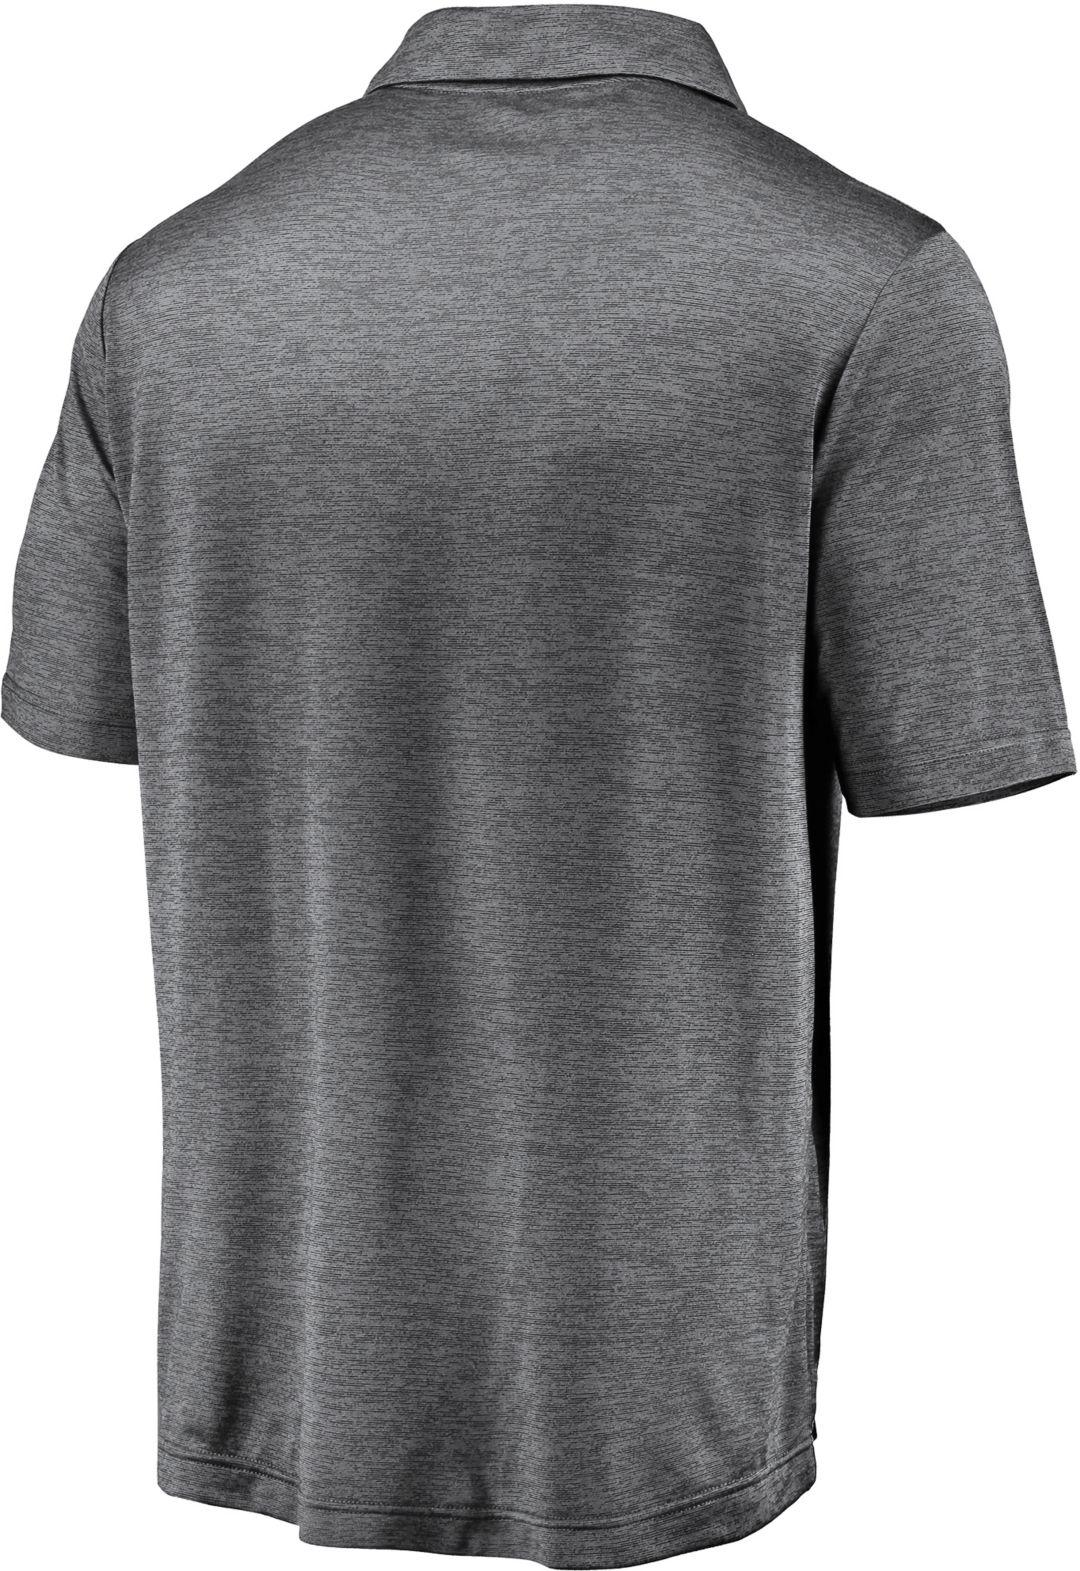 on sale 64549 5ad25 NHL Men s Dallas Stars Logo Grey Polo   DICK S Sporting Goods